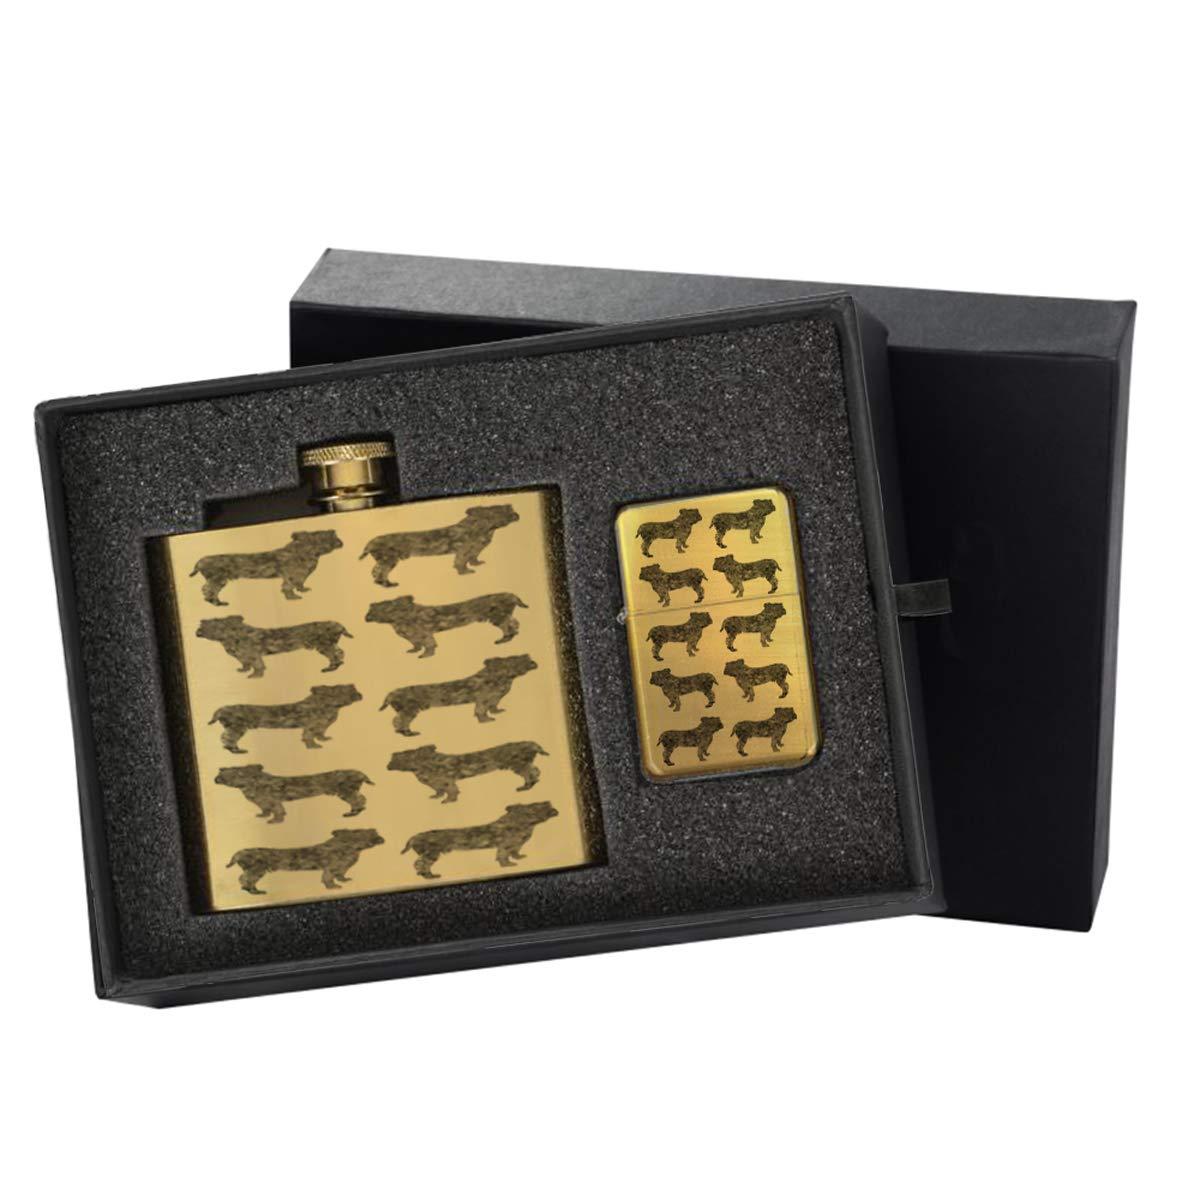 English Bulldog Pattern - Gold Lighter and Pocket Hip Liquor Flask Survival Camping Gift Box Set